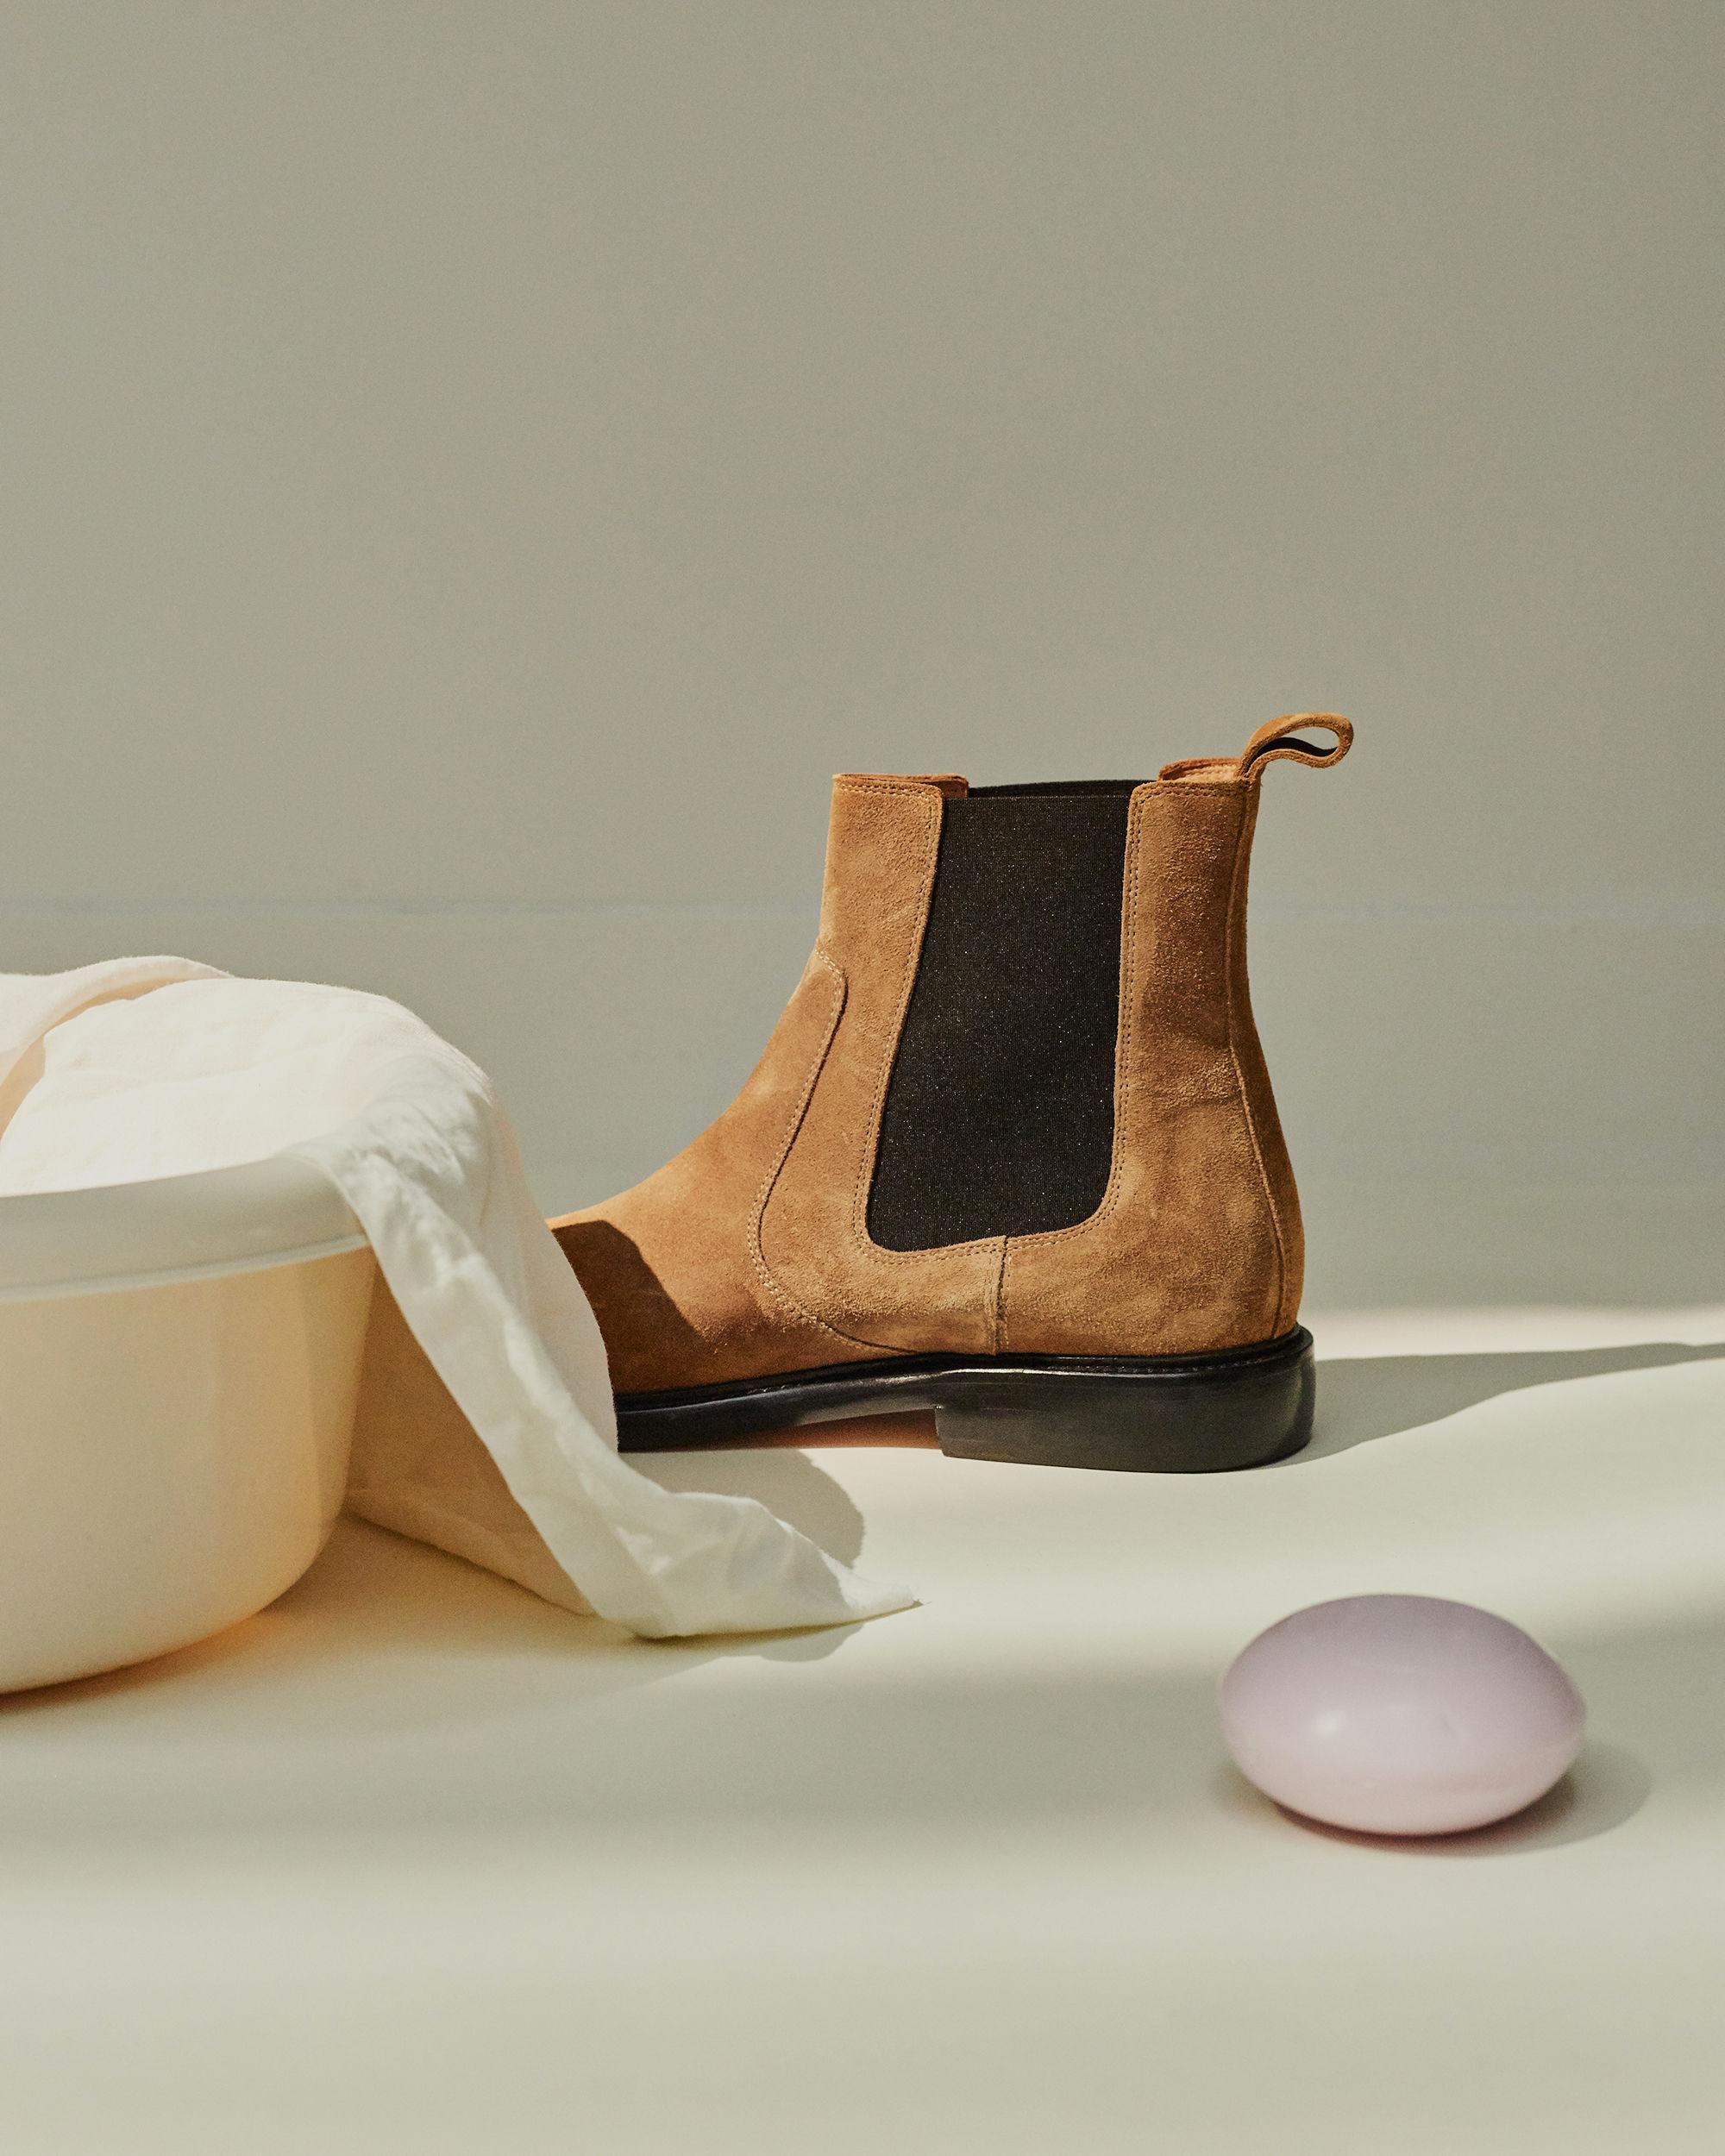 CHELT boots